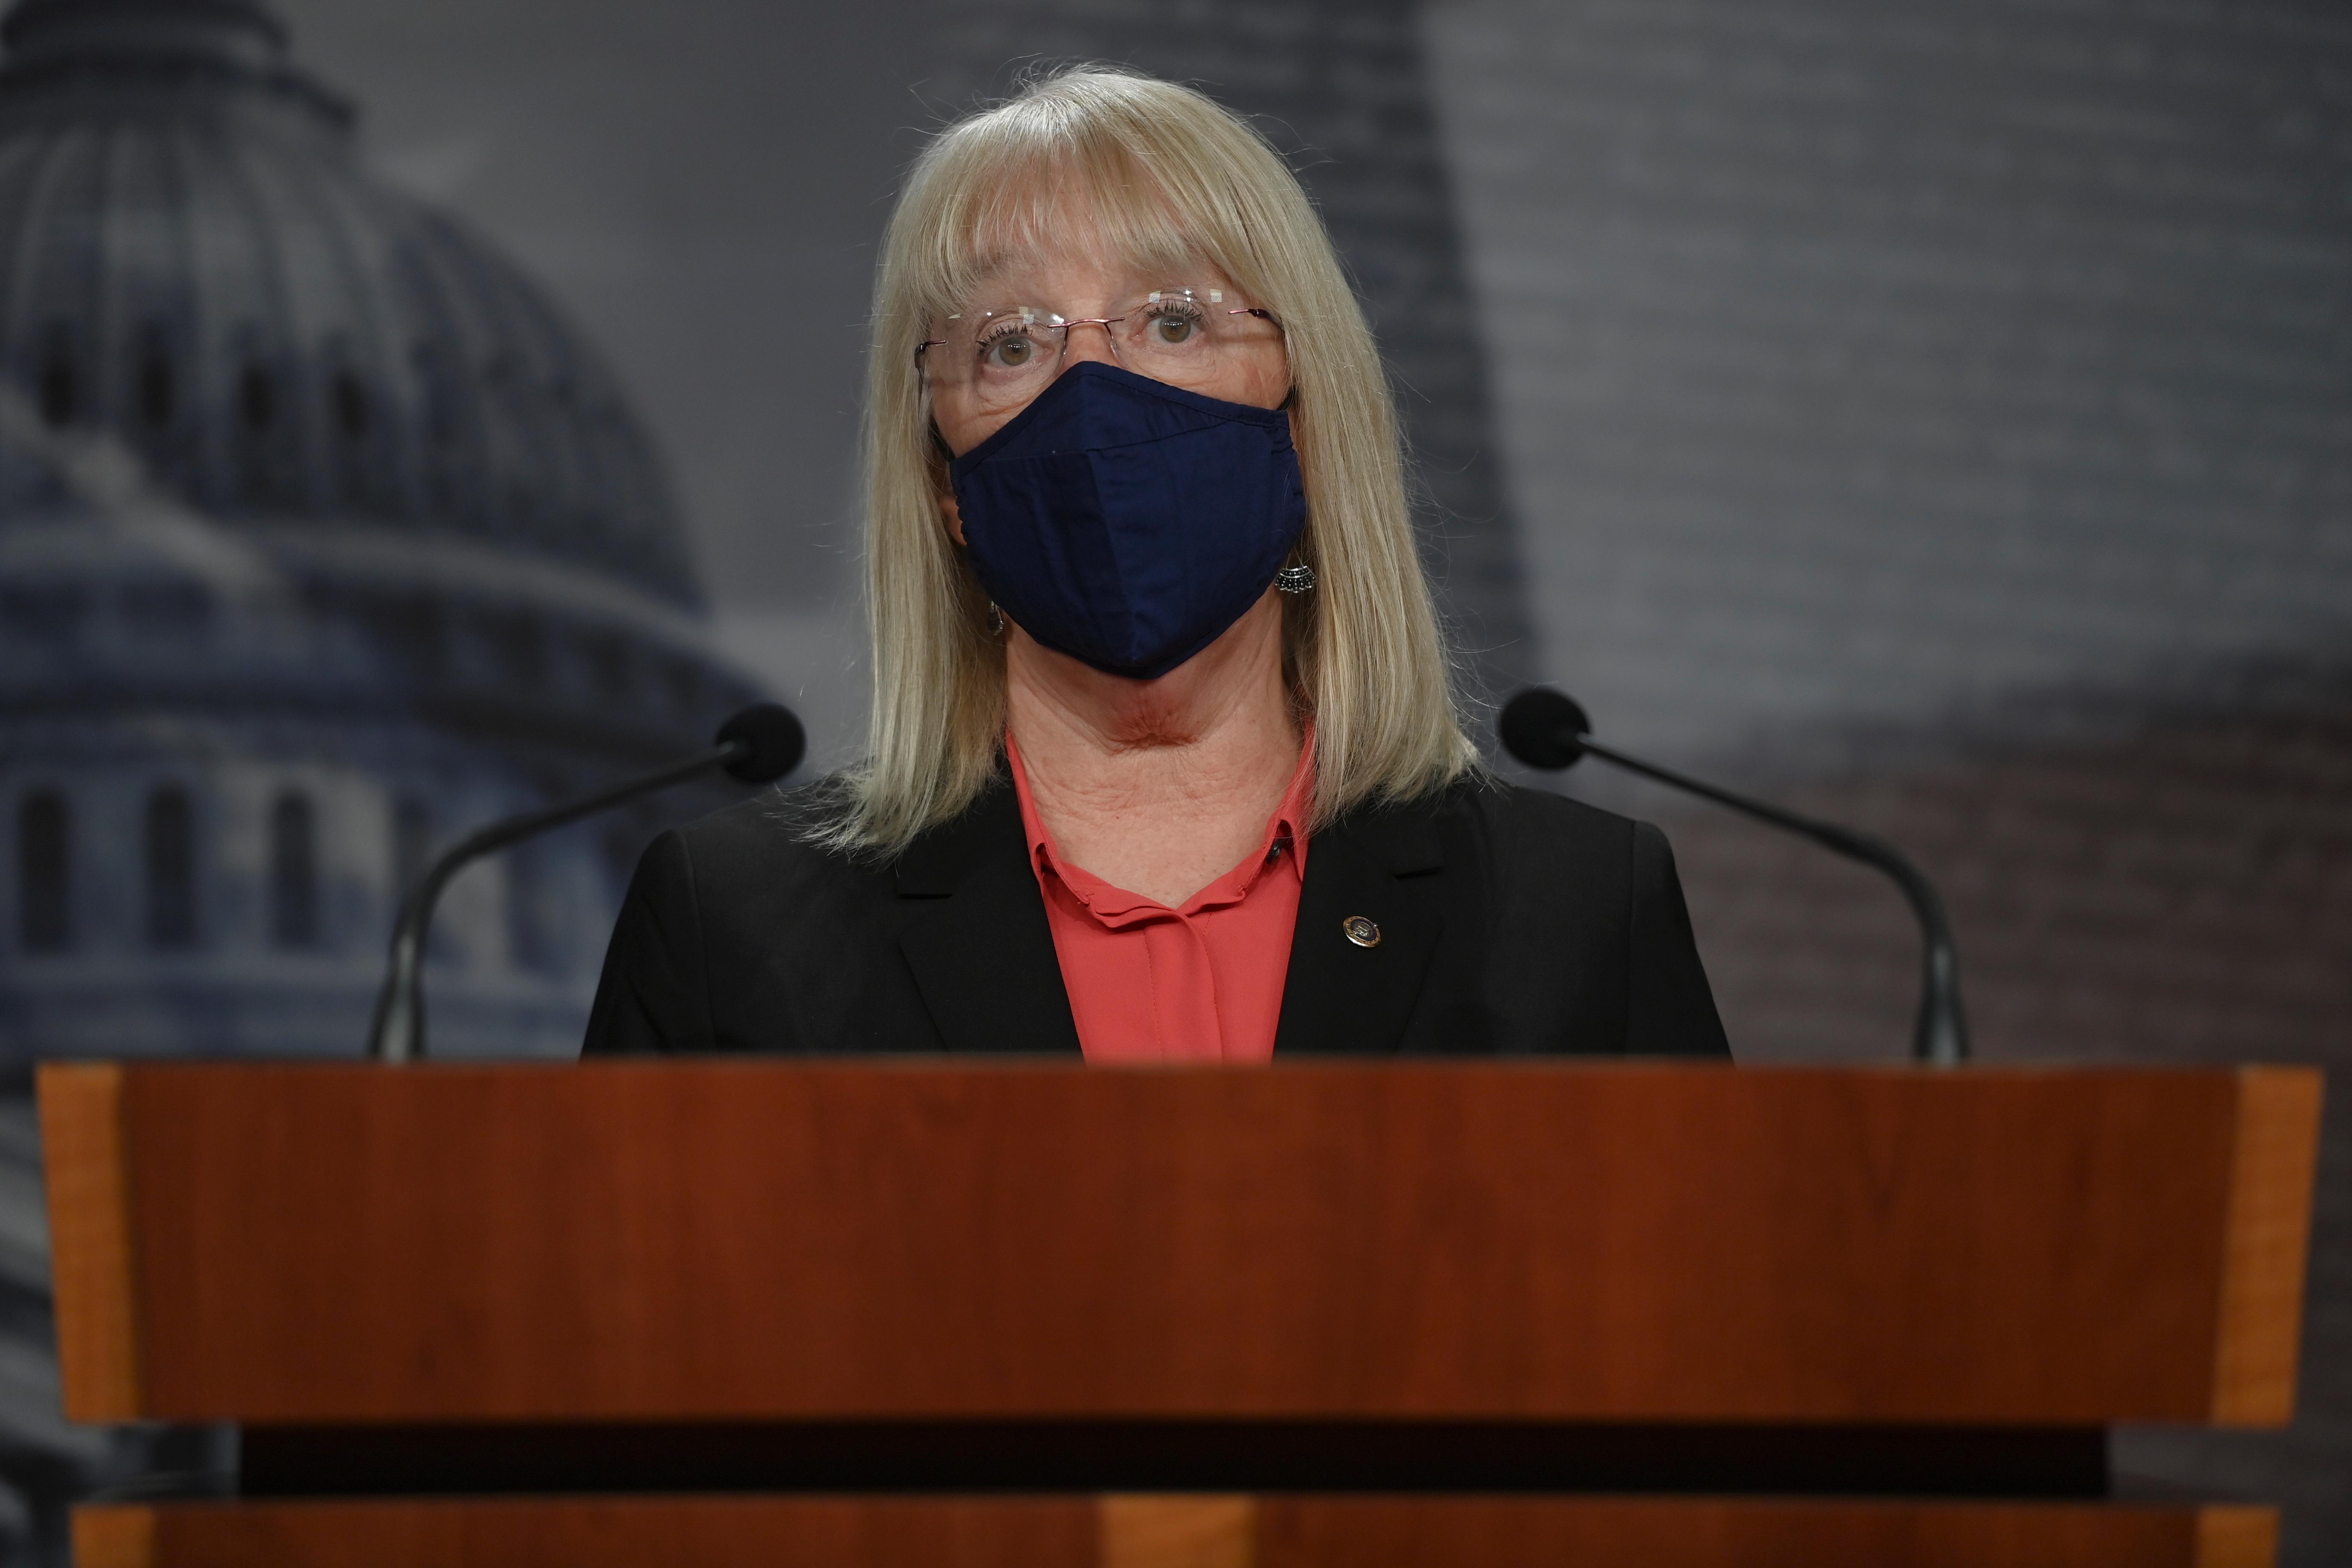 U.S. Senator Patty Murray (D-WA) speaks during a news conference at the U.S. Capitol, in Washington, U.S., February 2, 2021. REUTERS/Brandon Bell